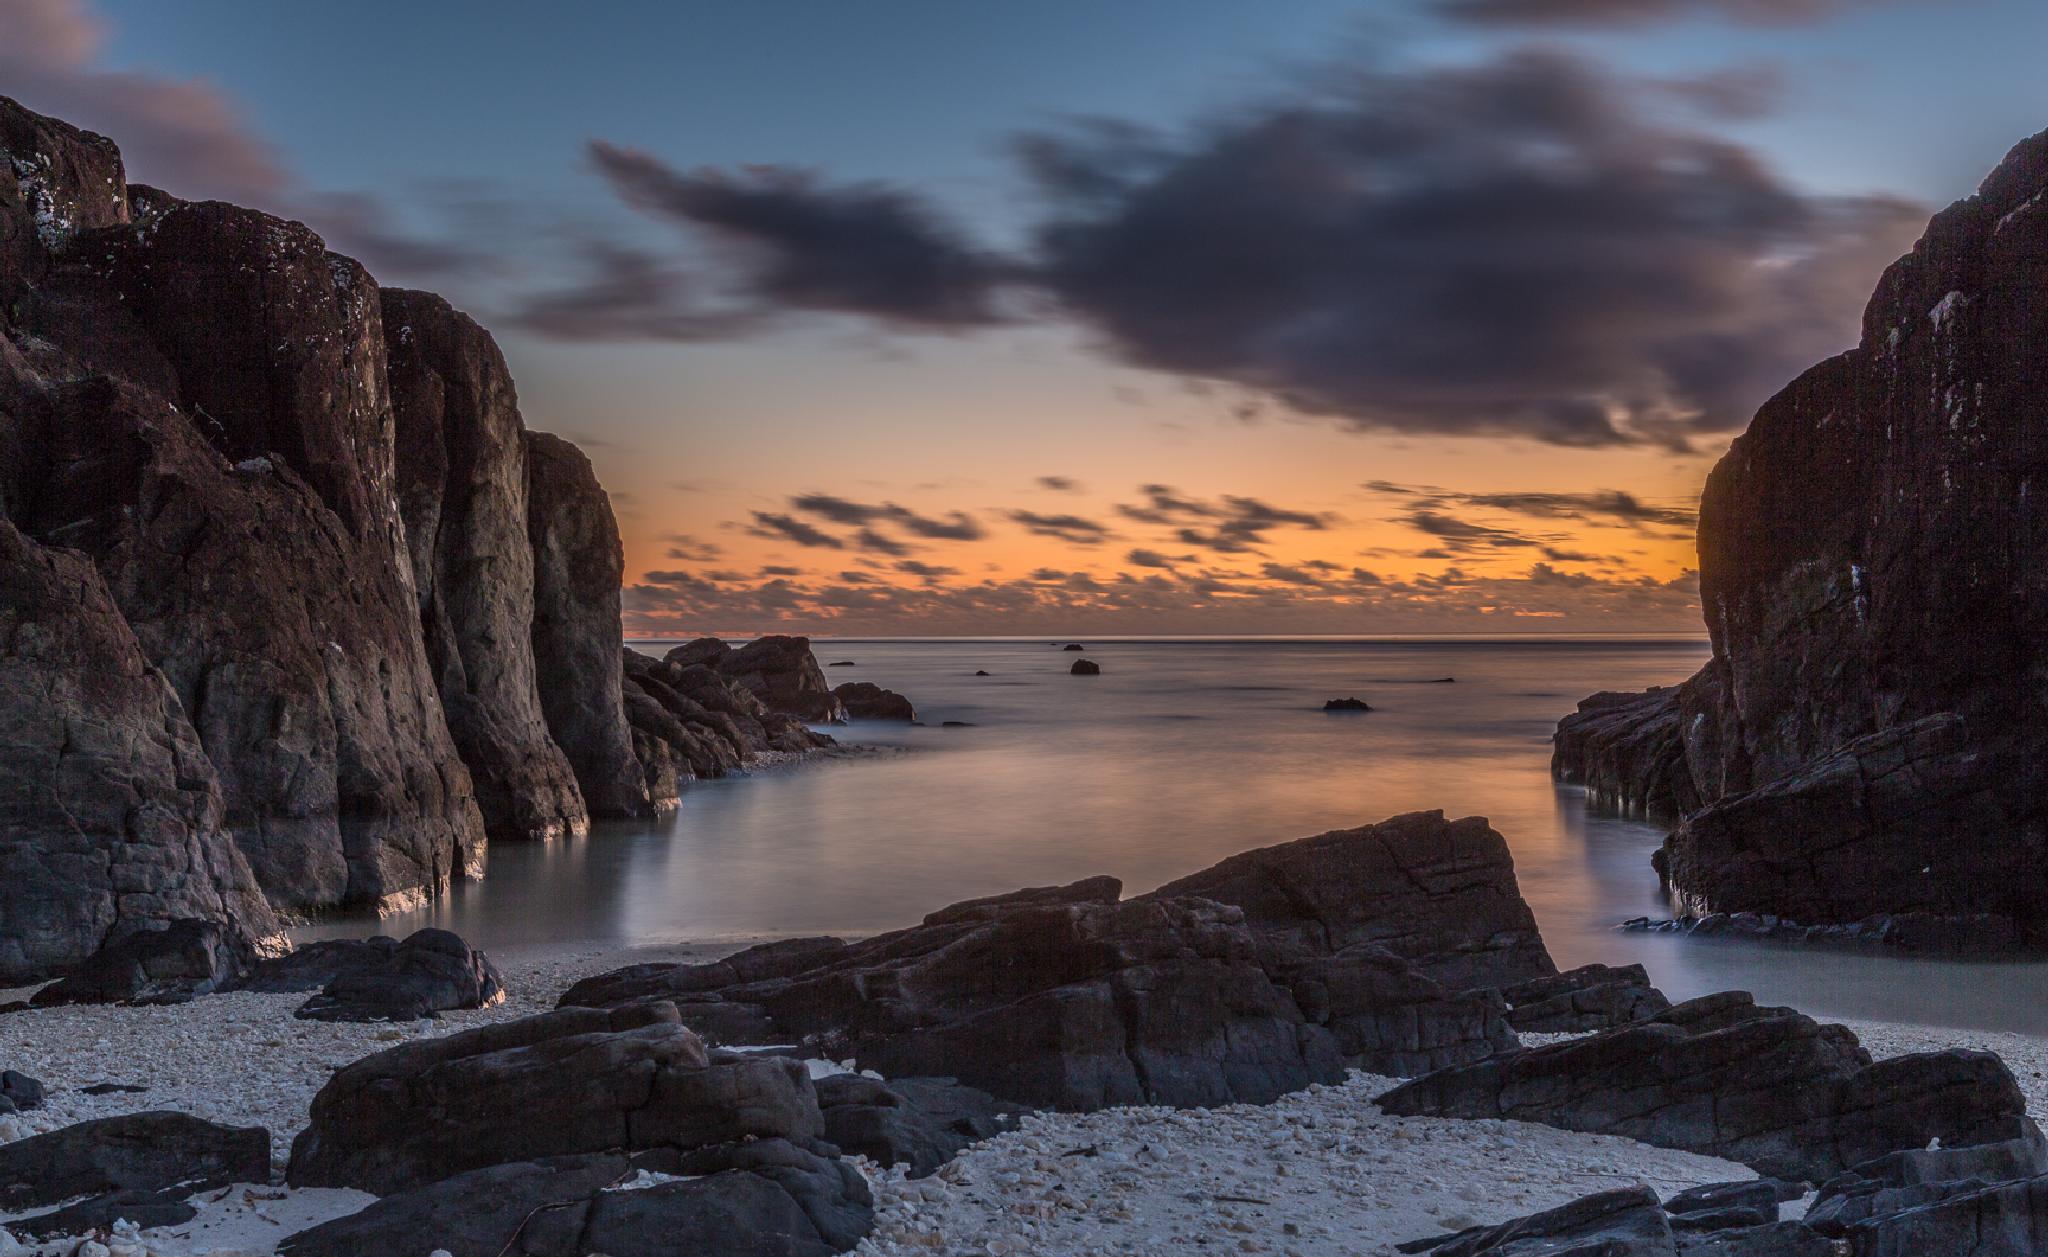 Sunset at Black Rock by sdixon2380